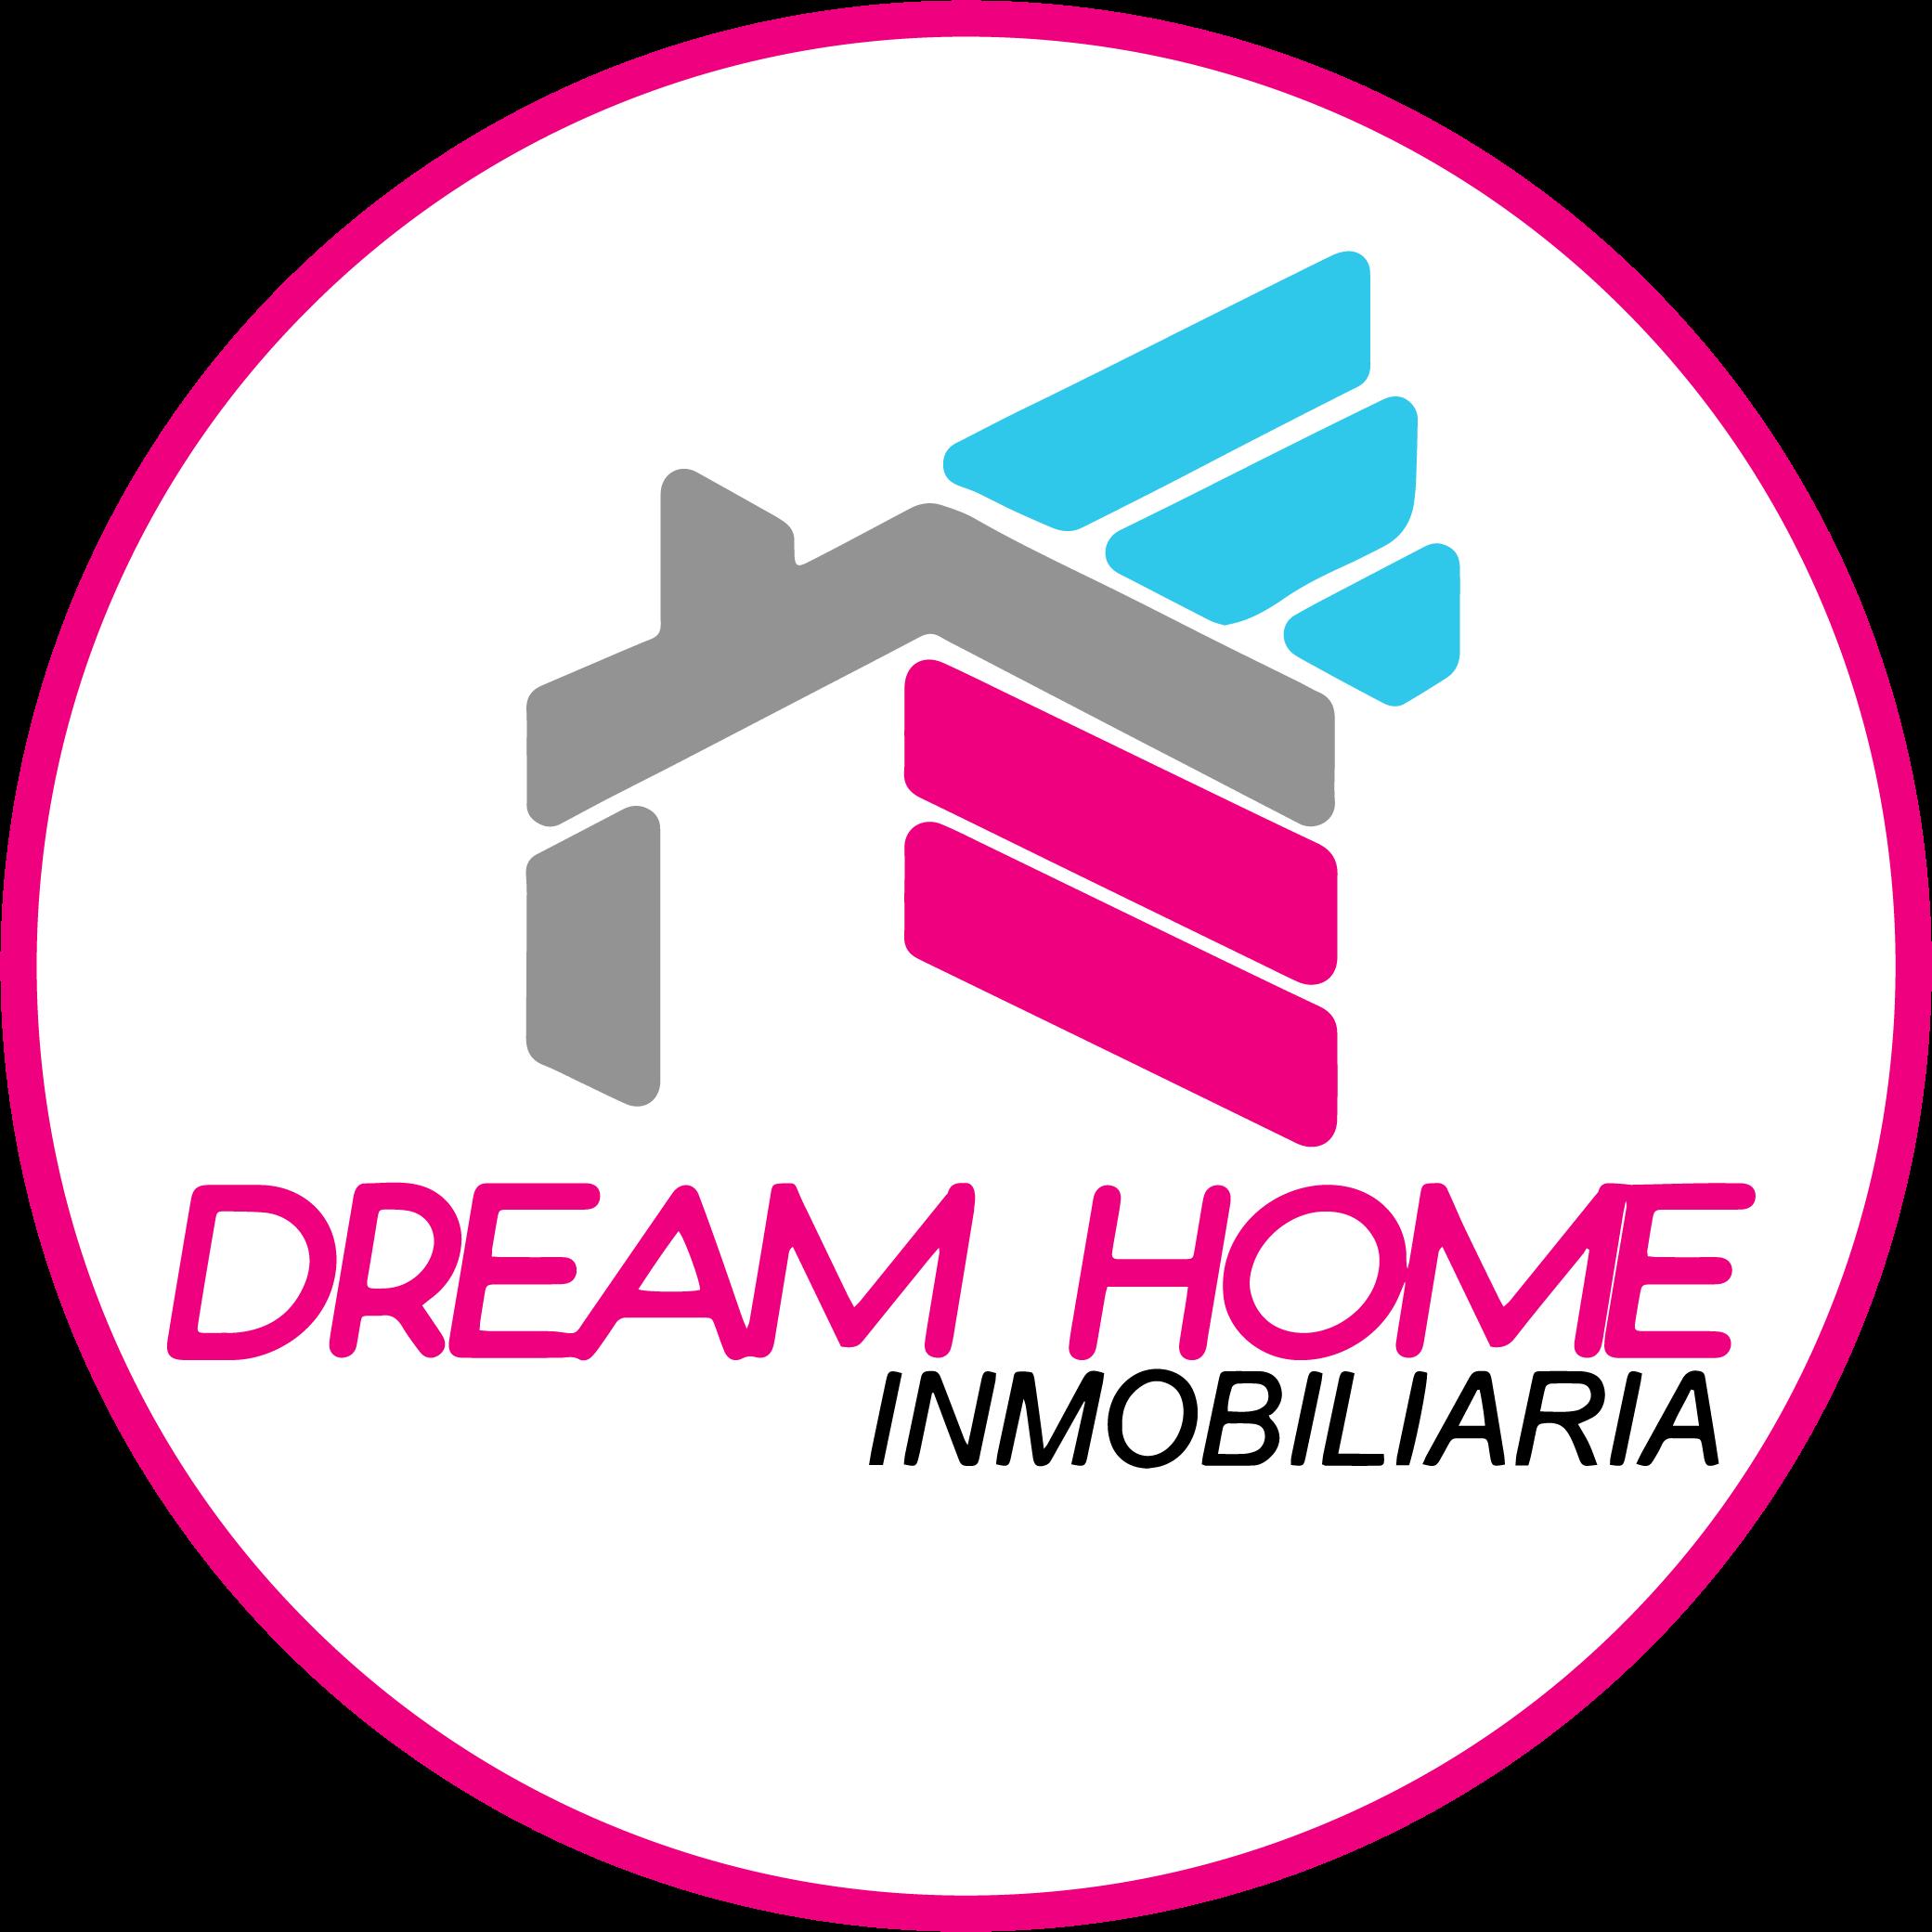 Inmobiliaria Dream Home